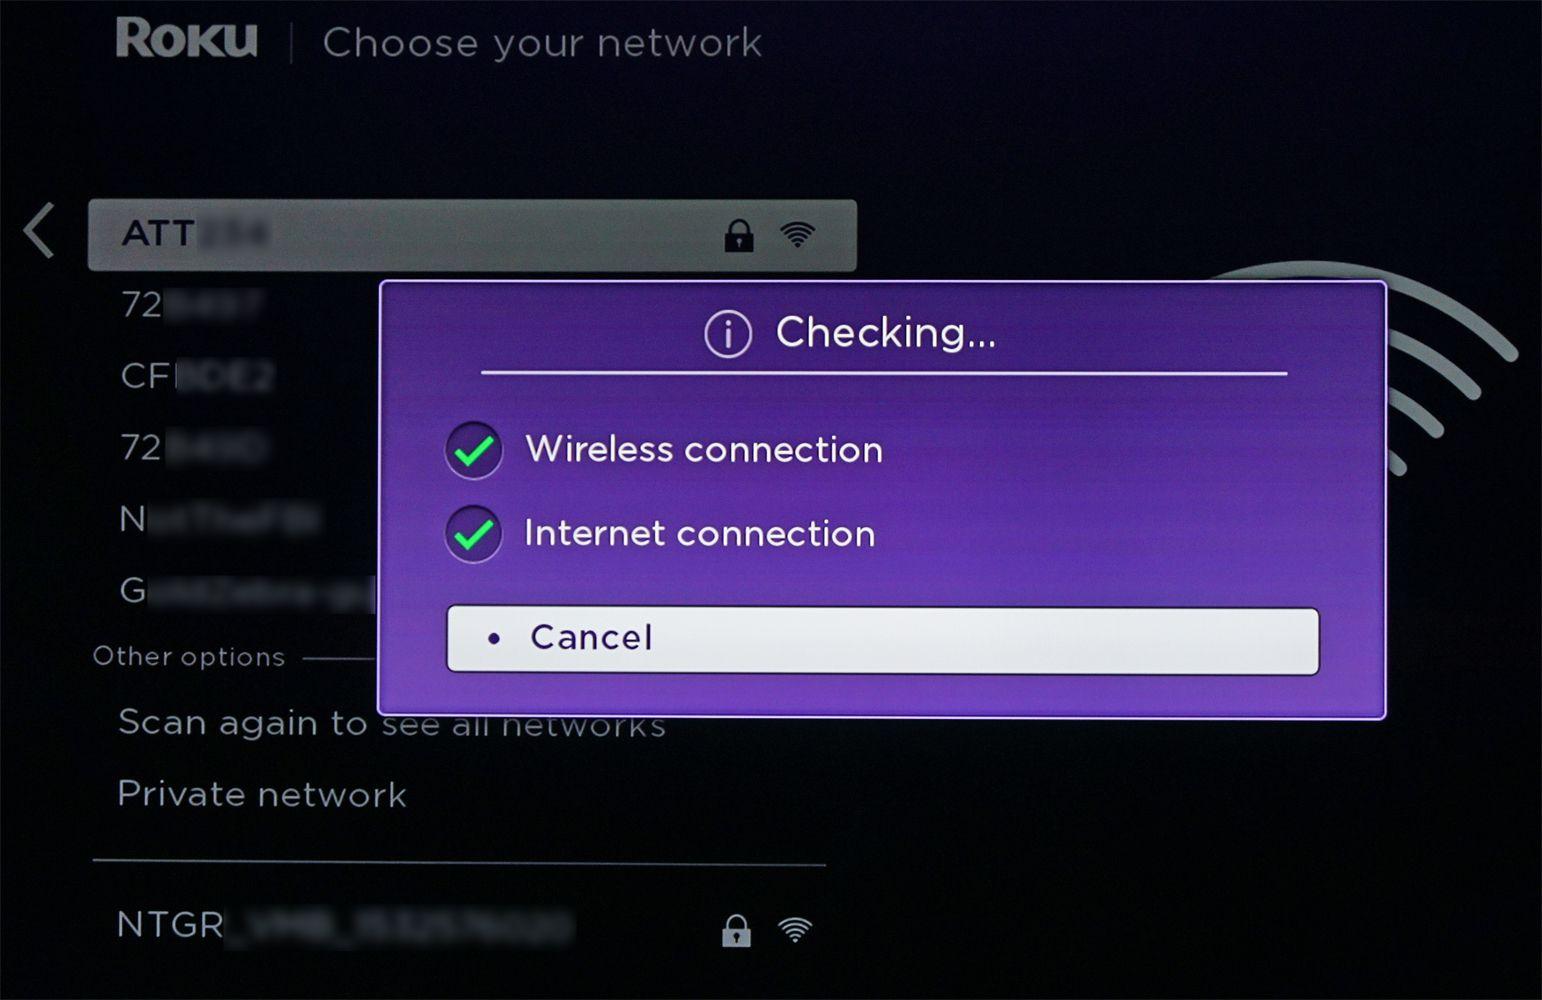 Roku Soundbar – Network Connection Confirmation